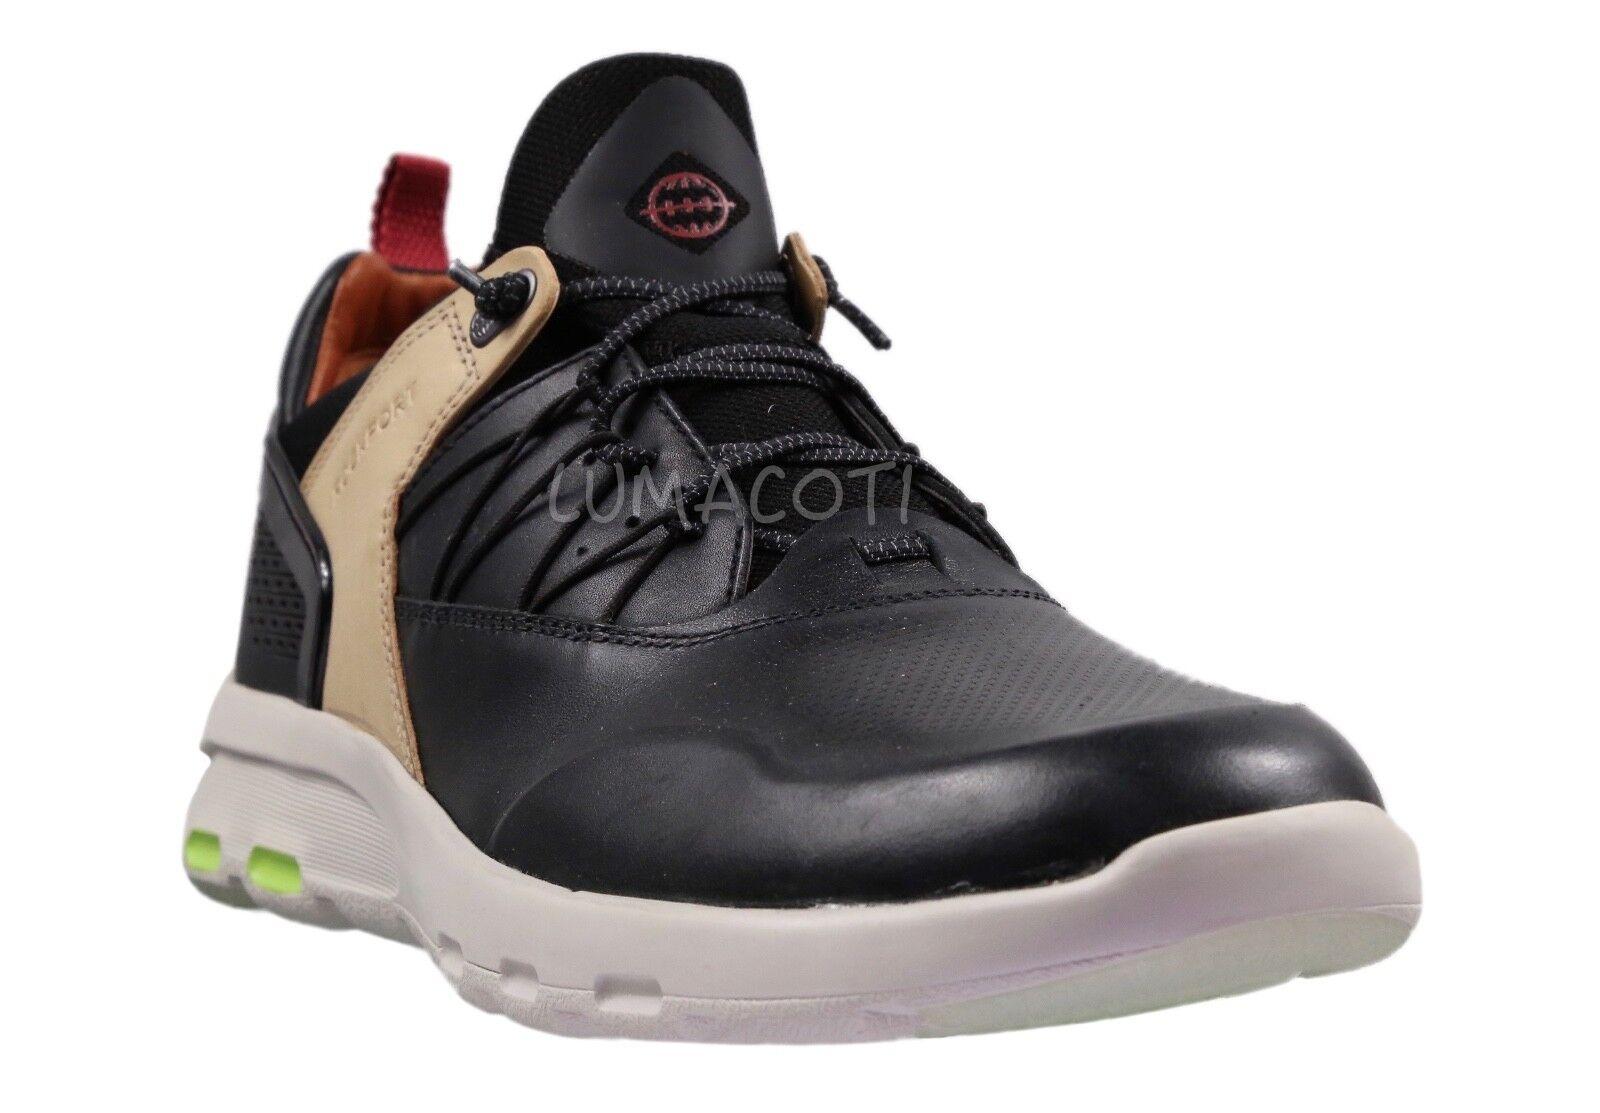 Mens Rockport Lets Walk Sneakers - Black Leather Size 9